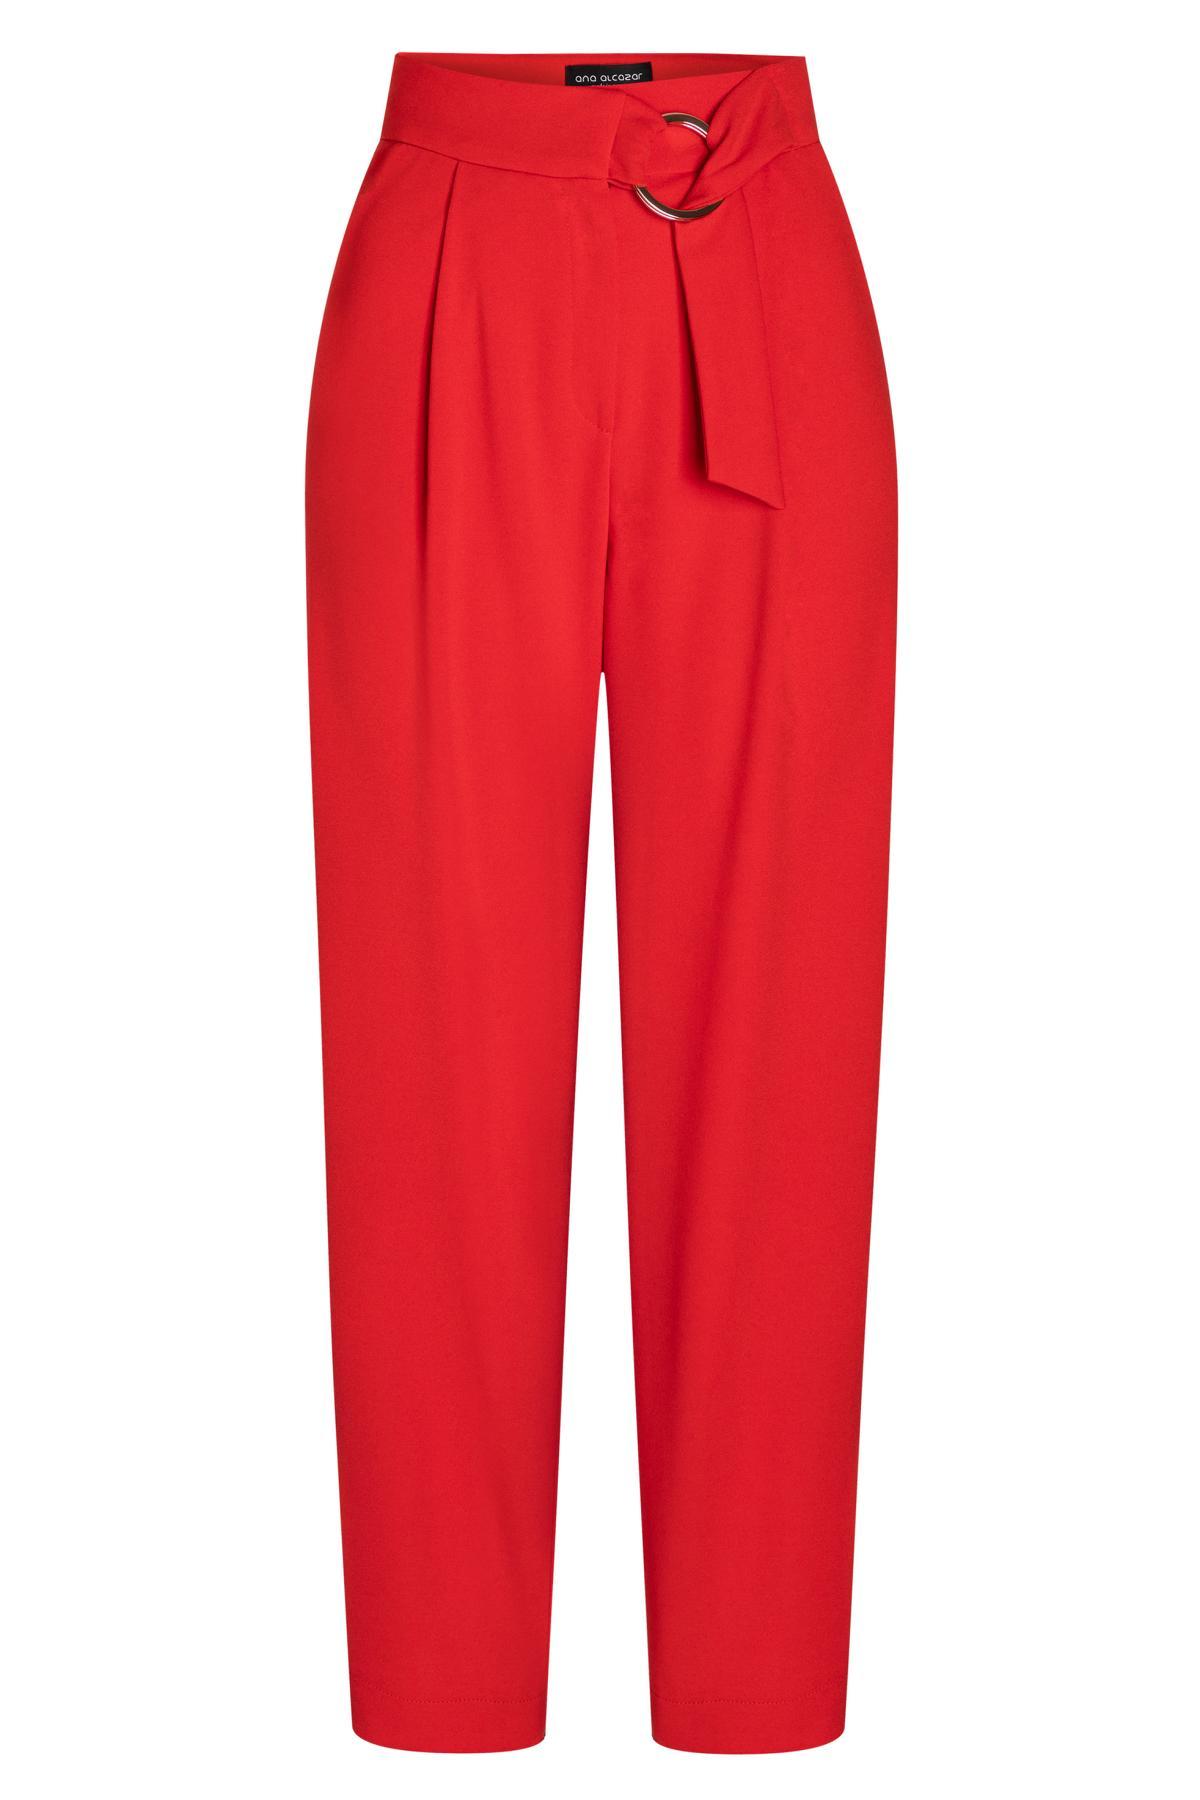 Ana Alcazar Cropped Pants Seadone Red